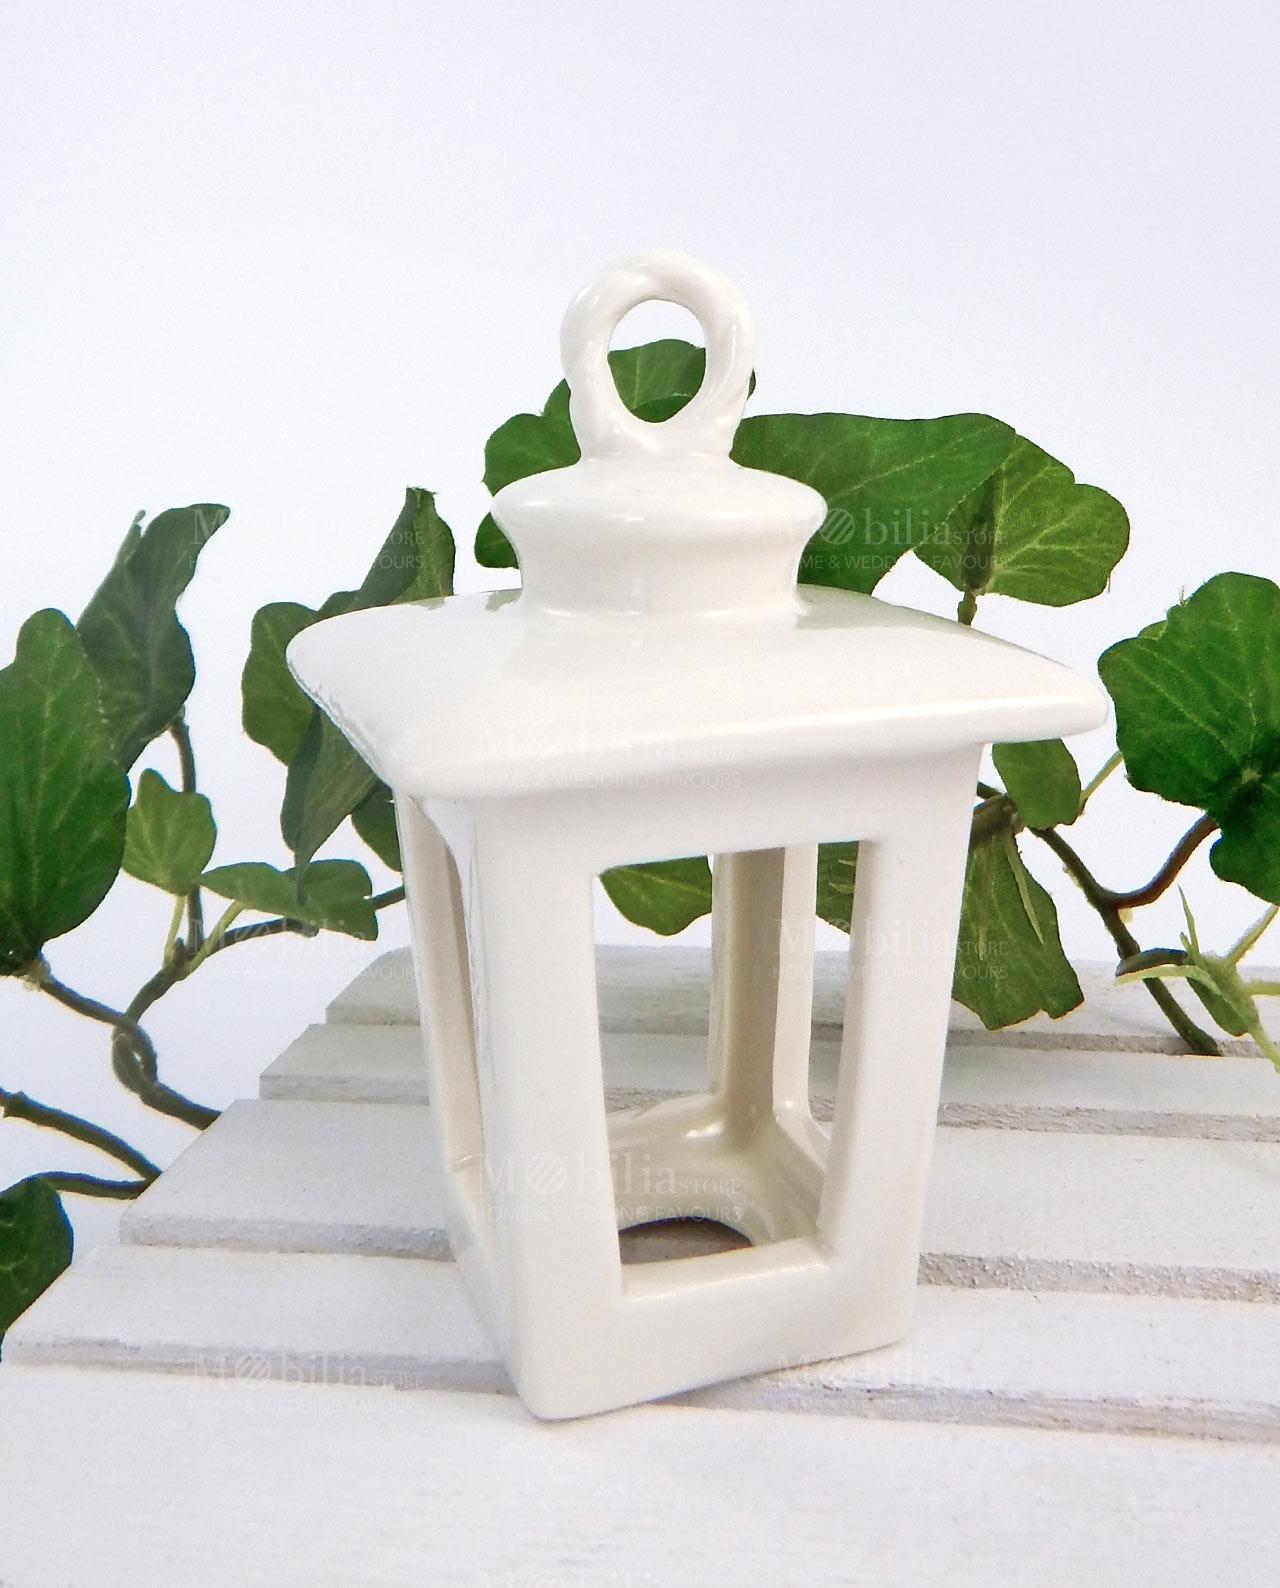 Lanterne portacandele porcellana bianca - Lanterne portacandele ...